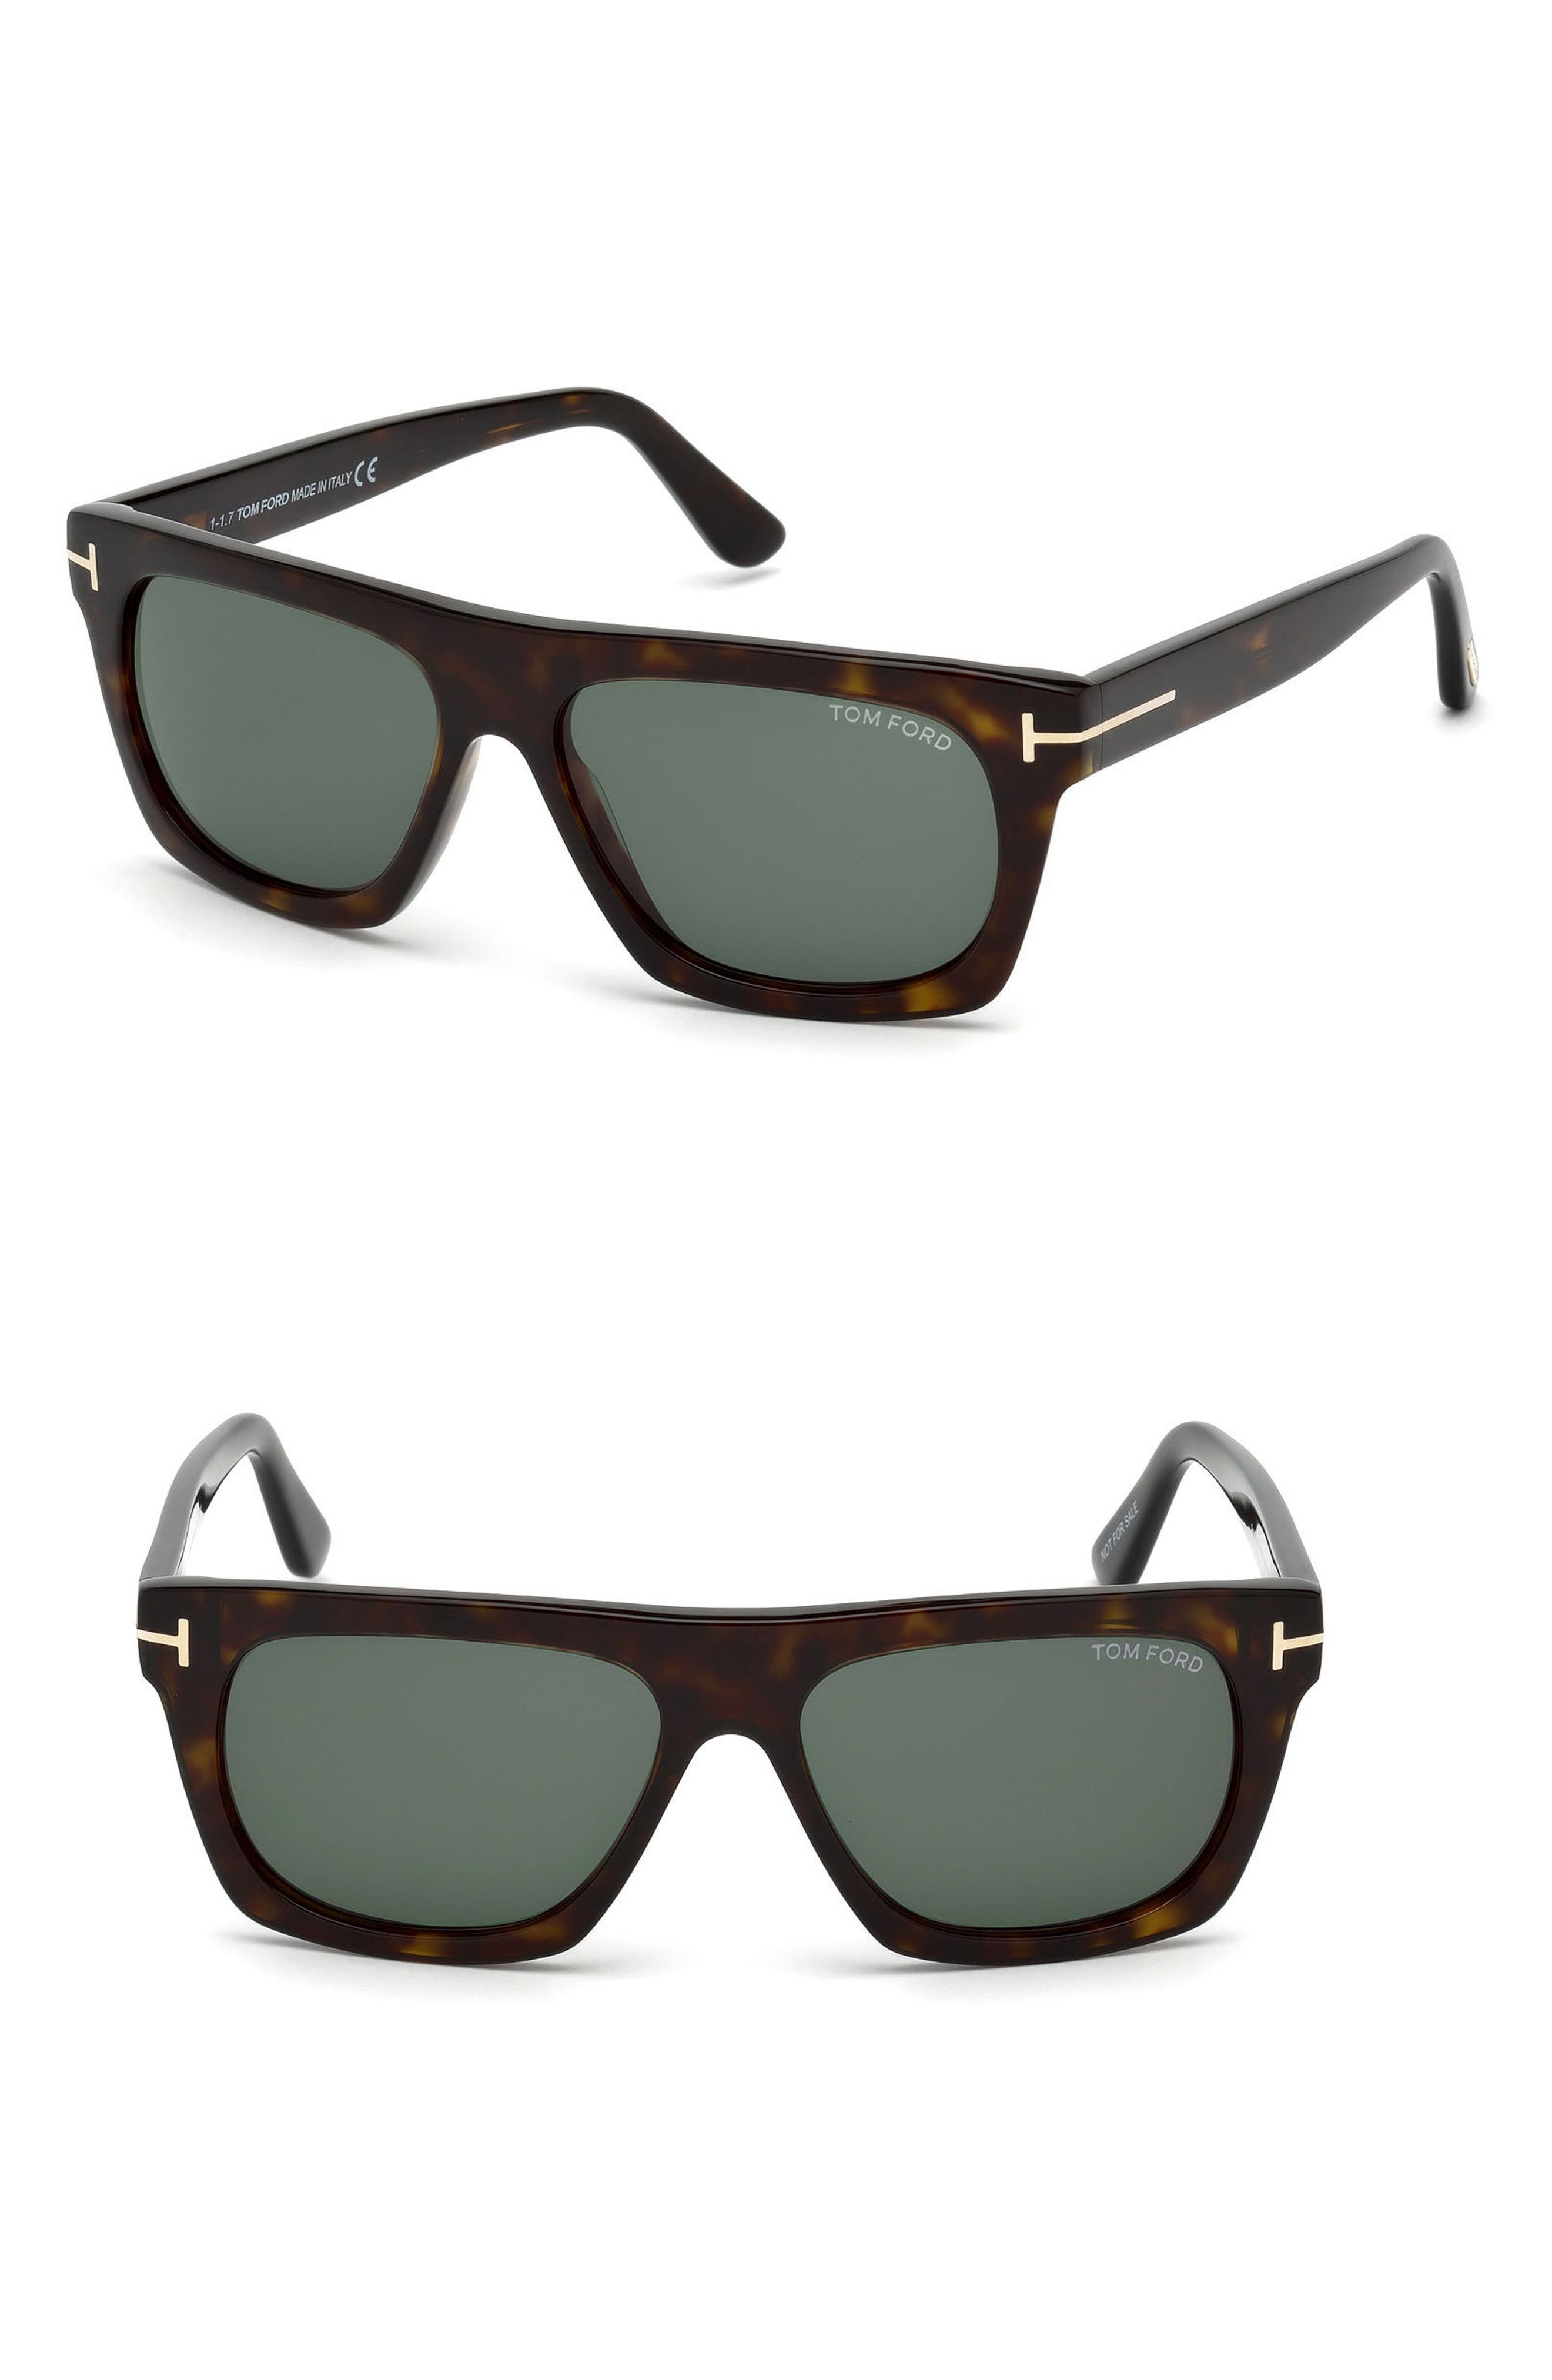 Ernesto 55mm Sunglasses,                         Main,                         color, Dark Havana/ Green Lenses